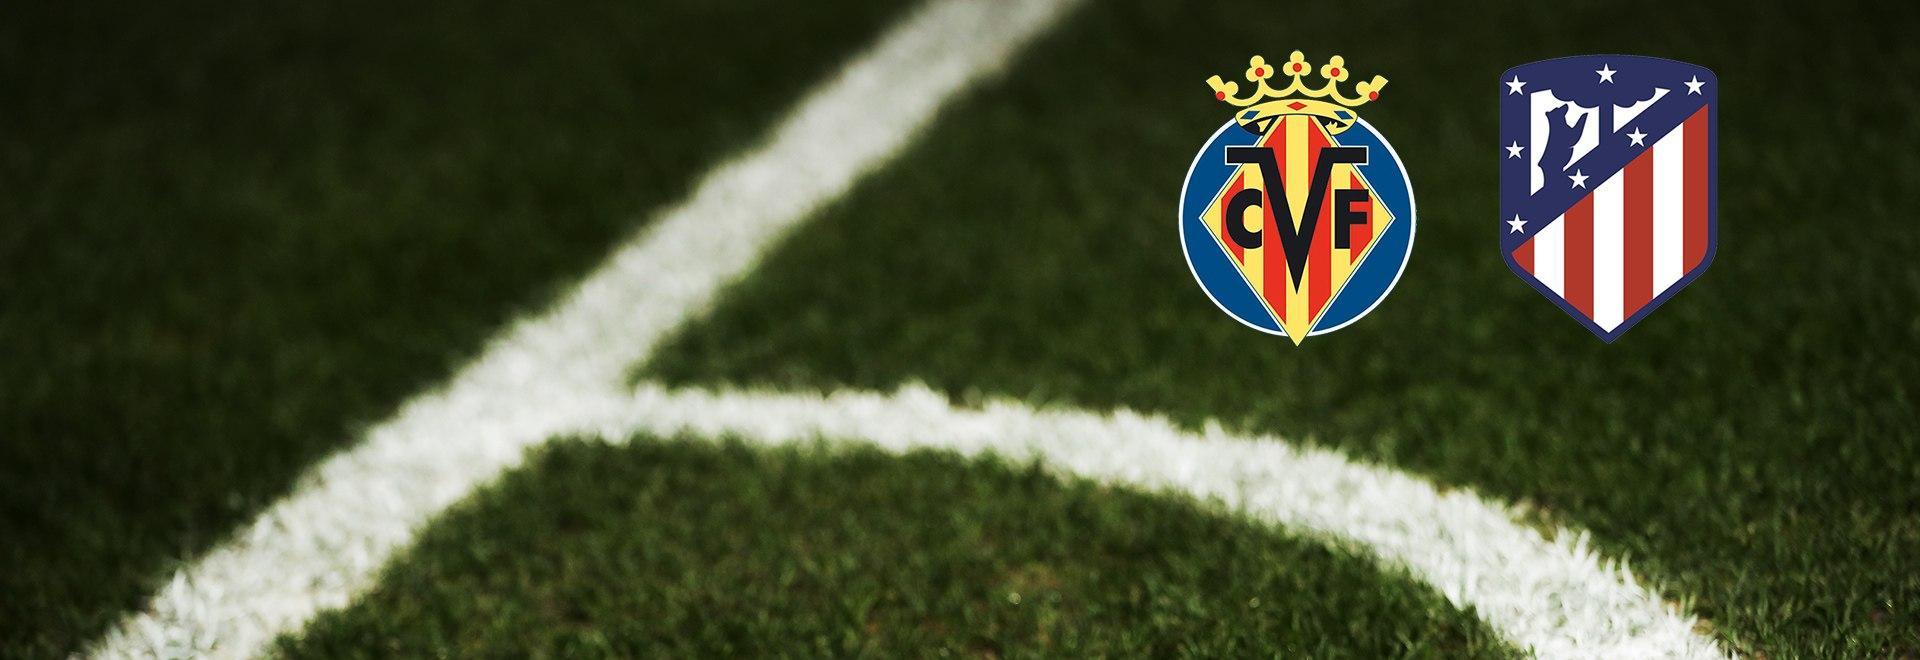 Villarreal - Atletico M.. 16a g.